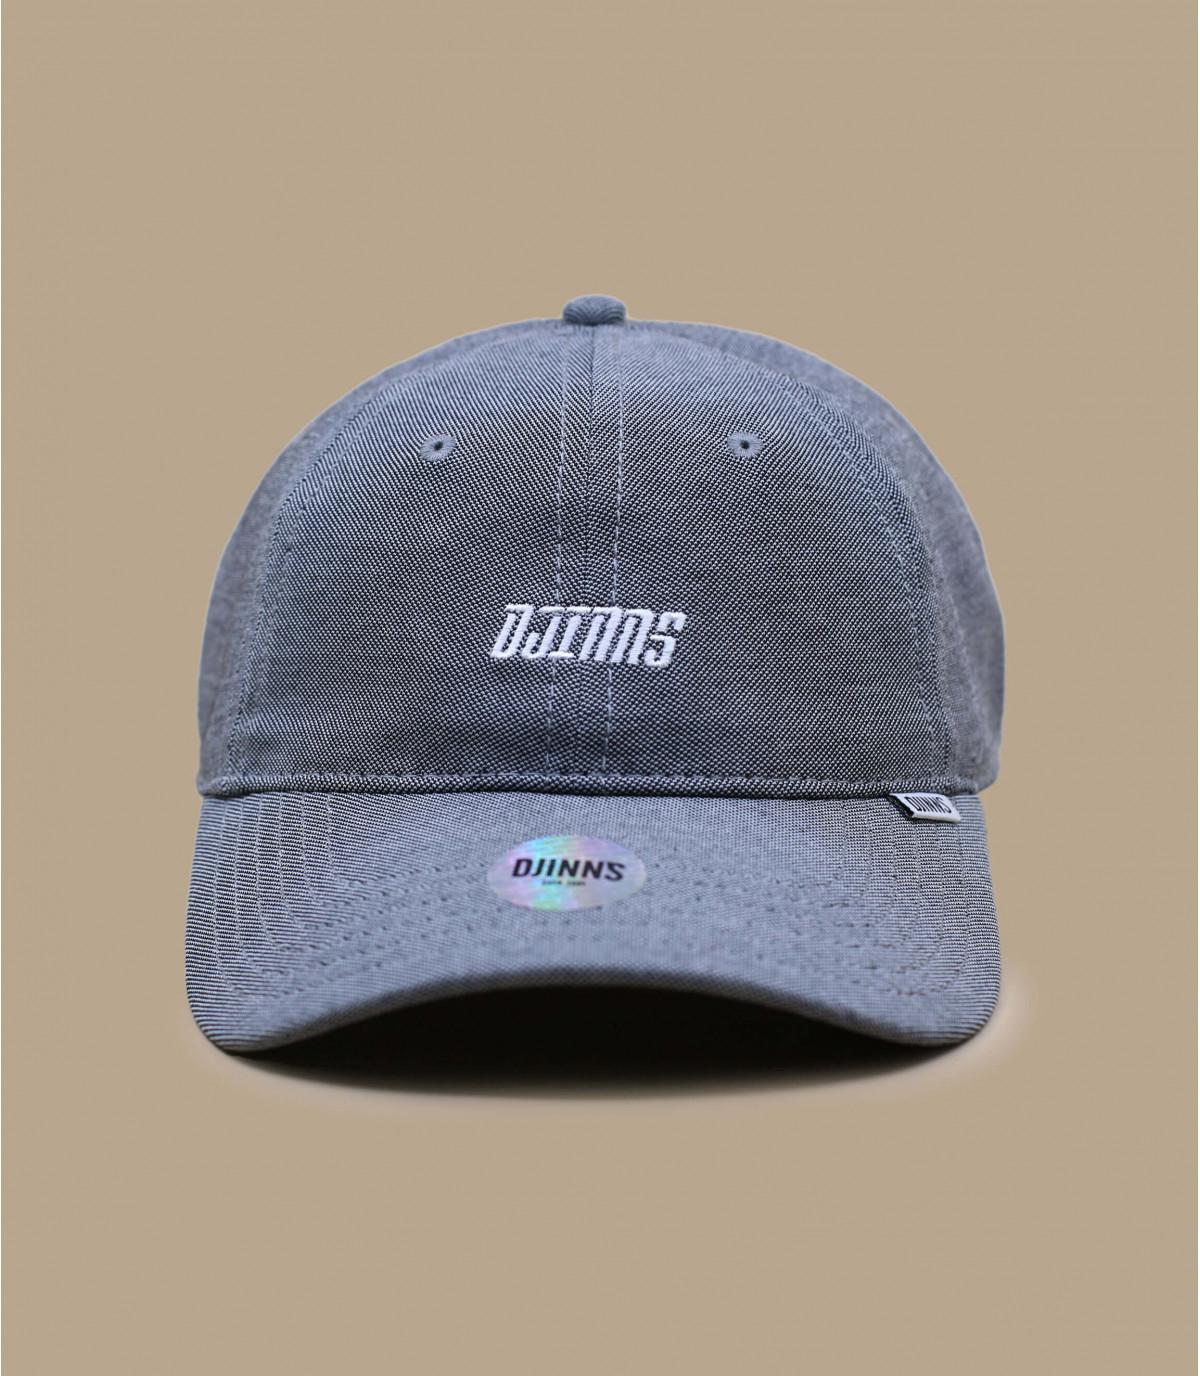 black Djinns curve cap